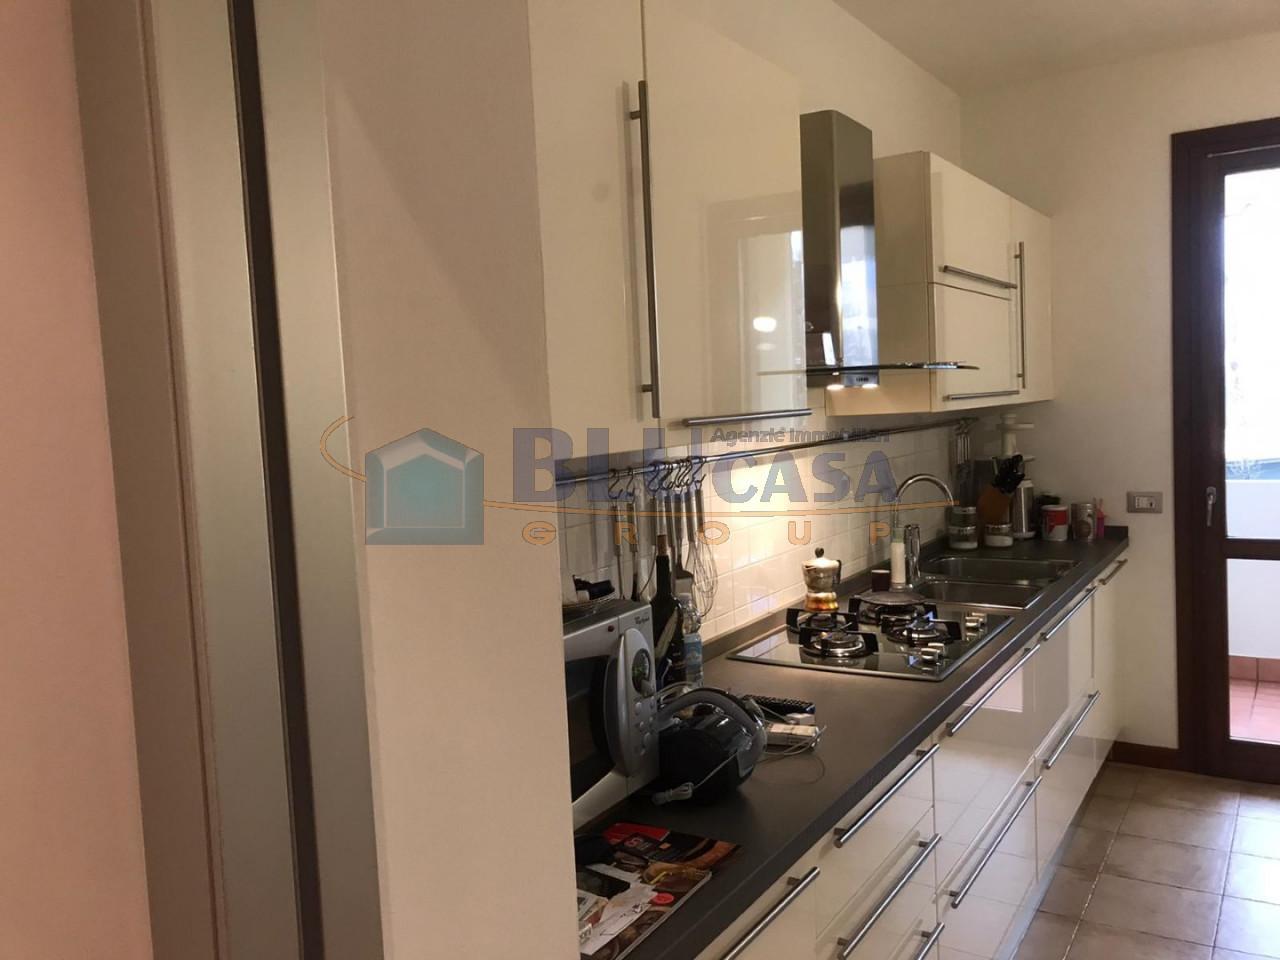 D296 Elegante duplex tricamere con ottime finiture in vendita a Montegrotto Terme https://media.gestionaleimmobiliare.it/foto/annunci/200215/2167876/1280x1280/013__12_cucina__large.jpg